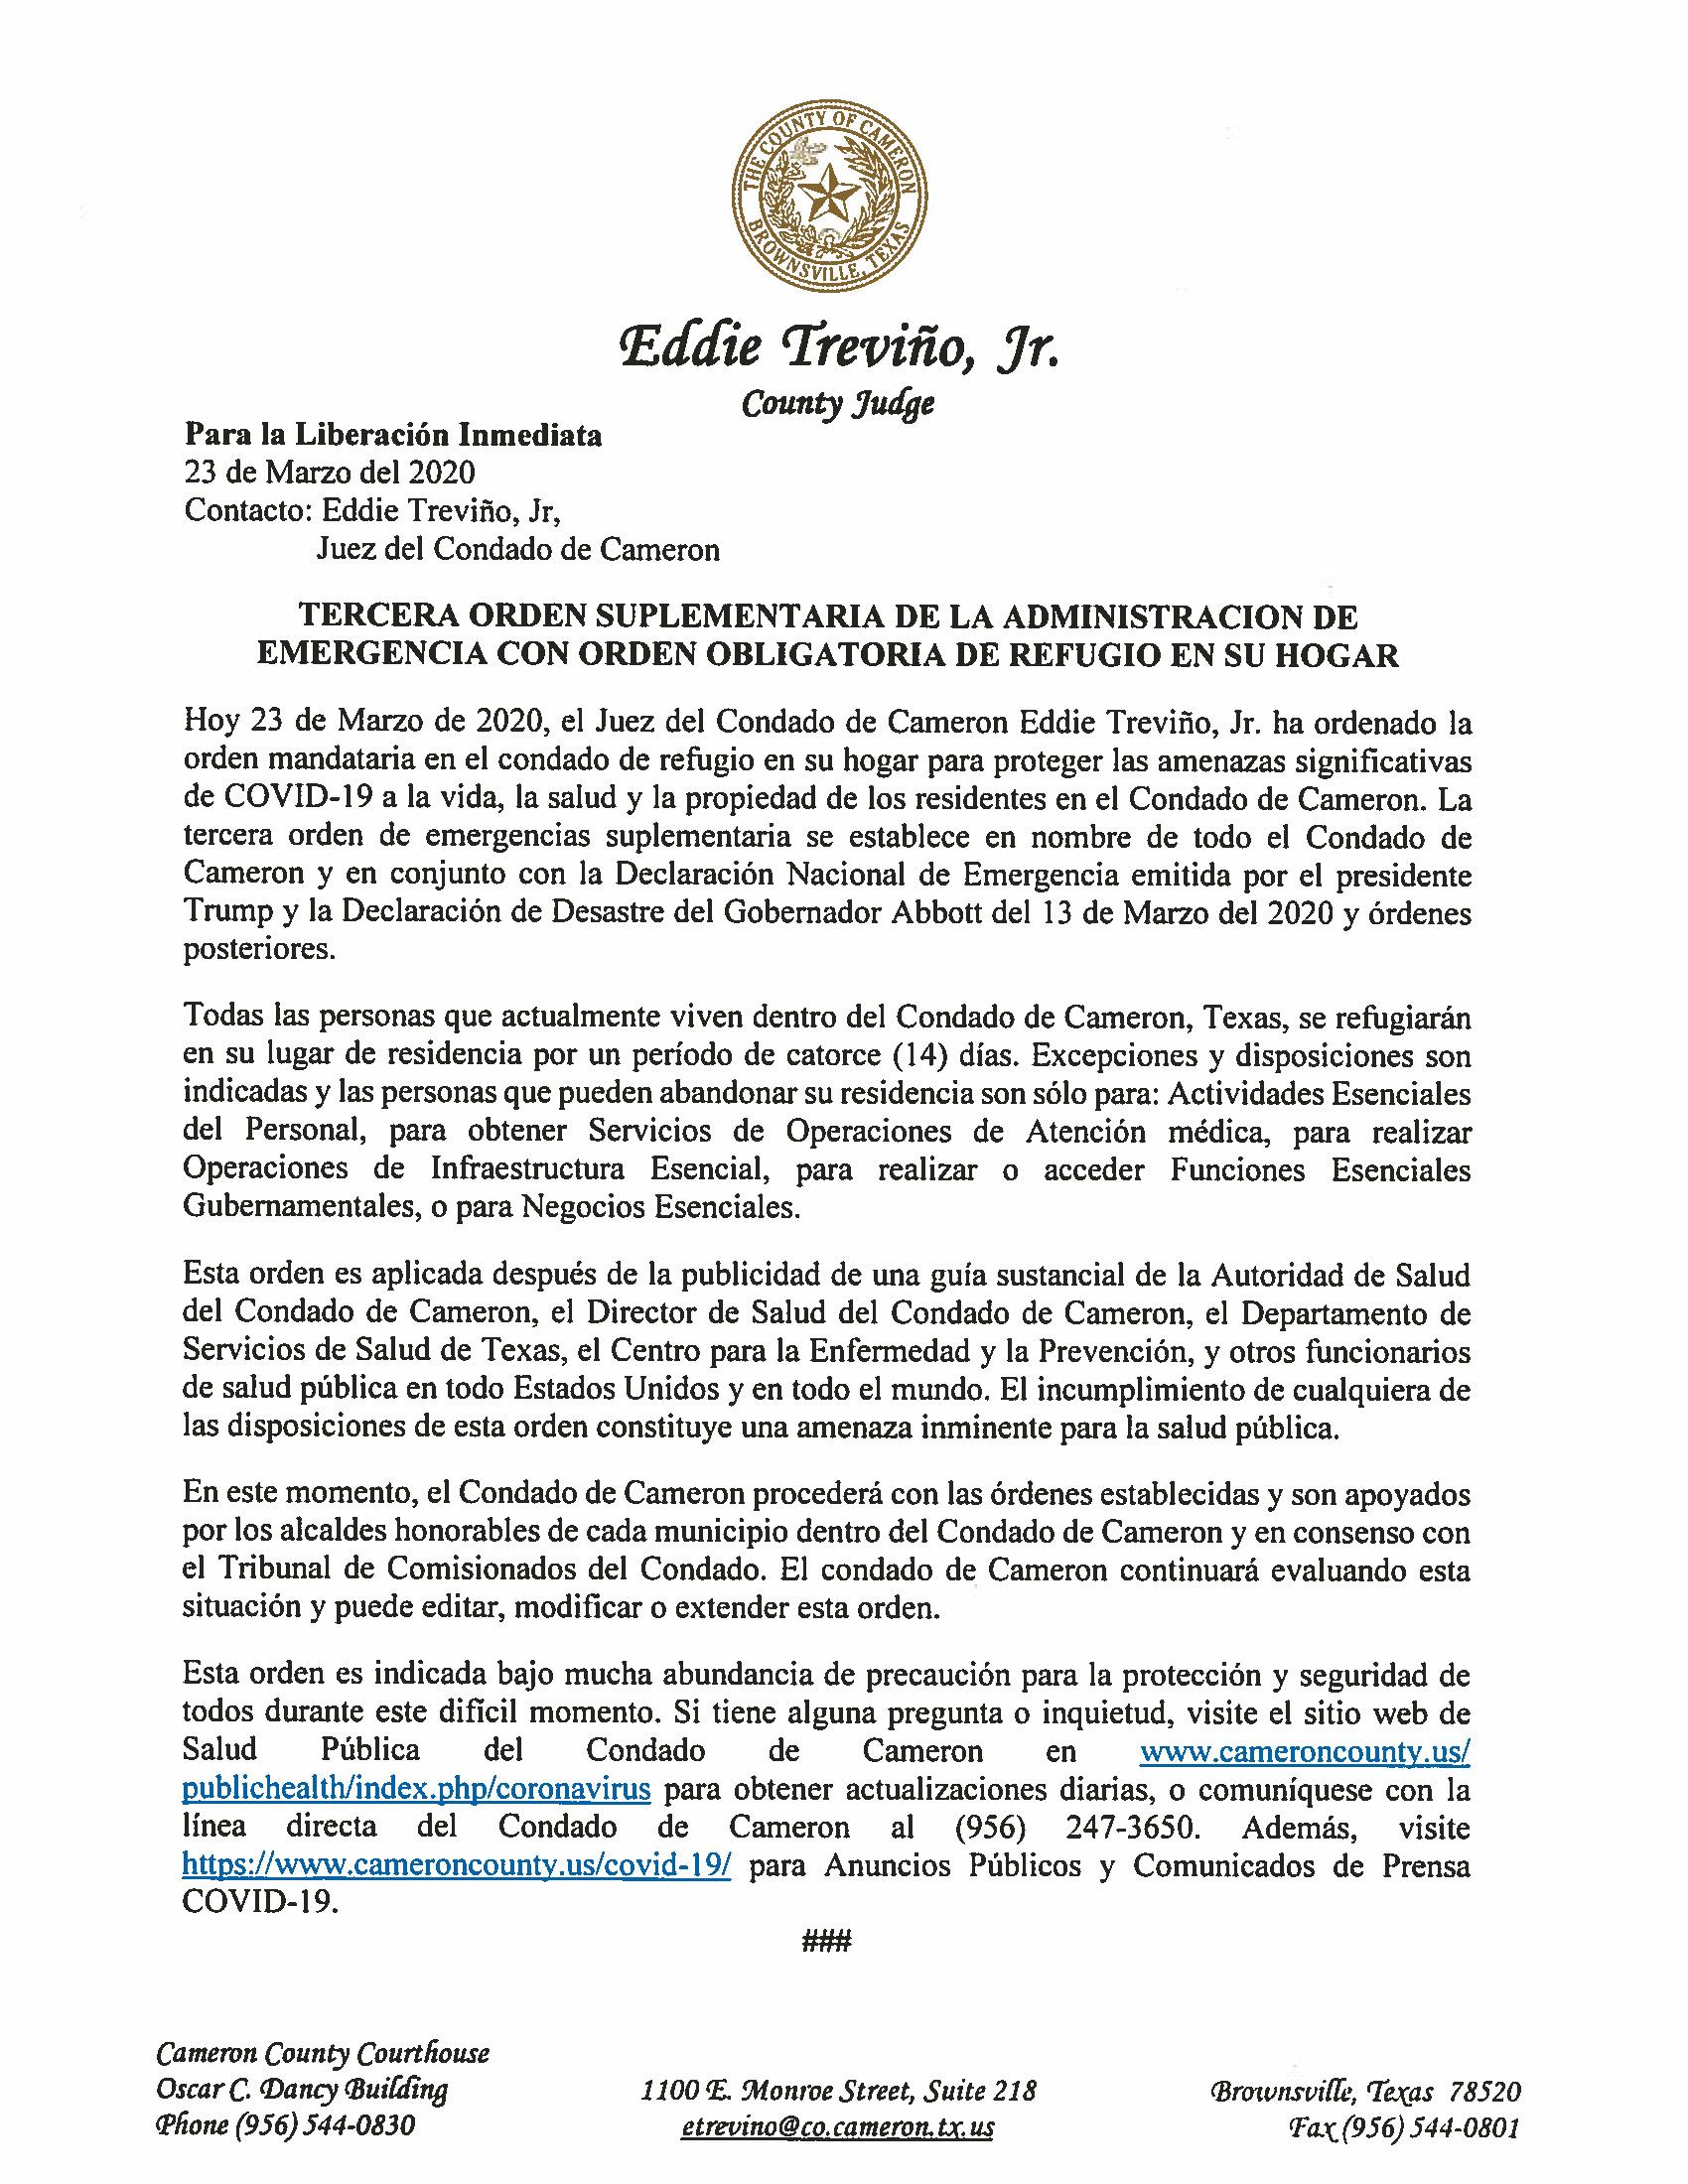 03.23.2020 Para La Liberacion Inmediata Tercera Orden Obligatoria